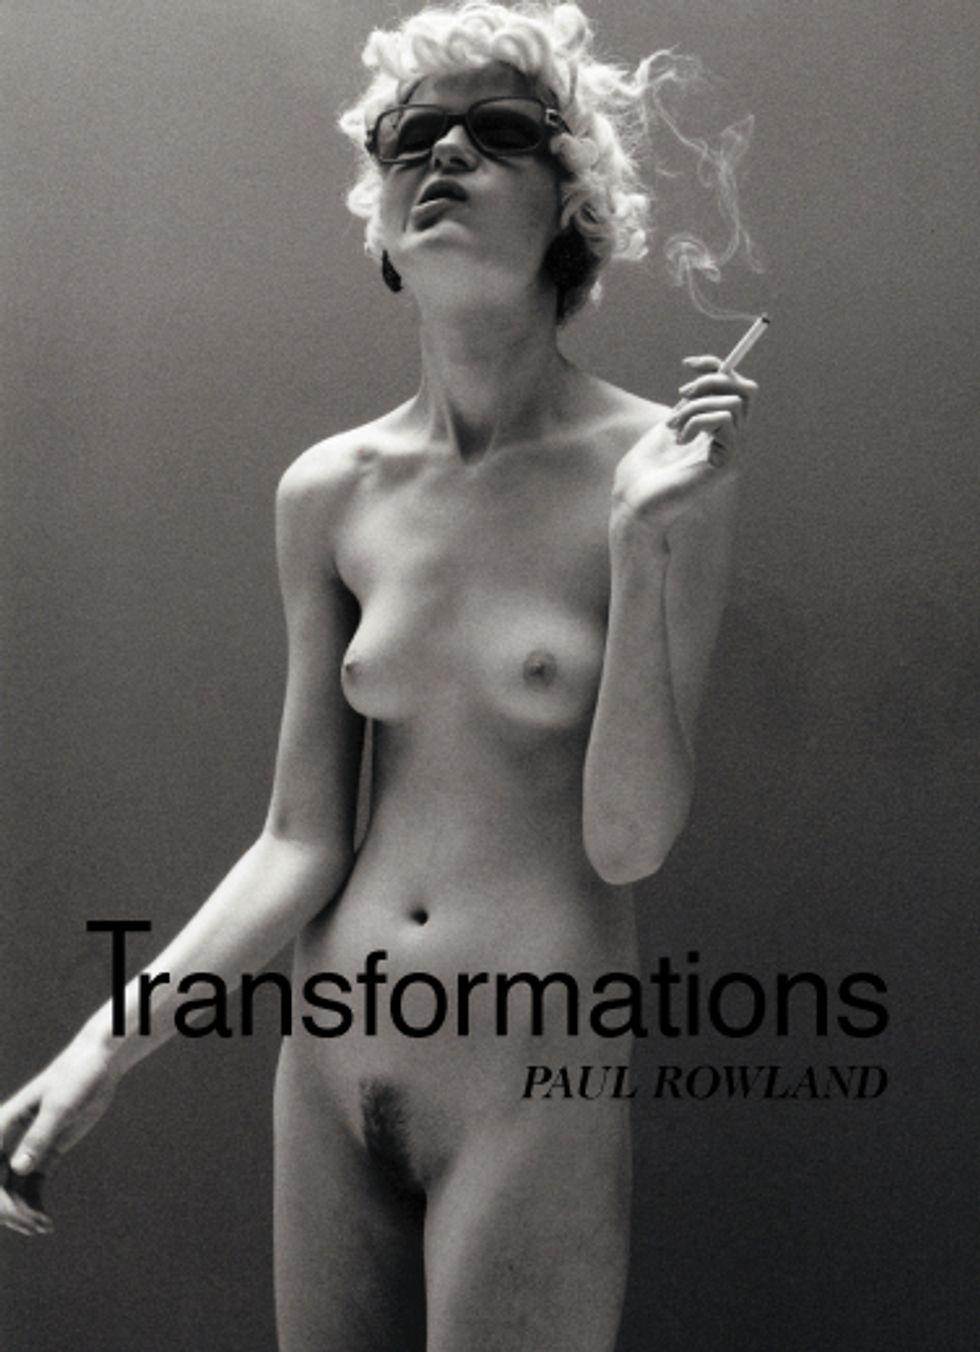 Paul Rowland's Art Basel Foray